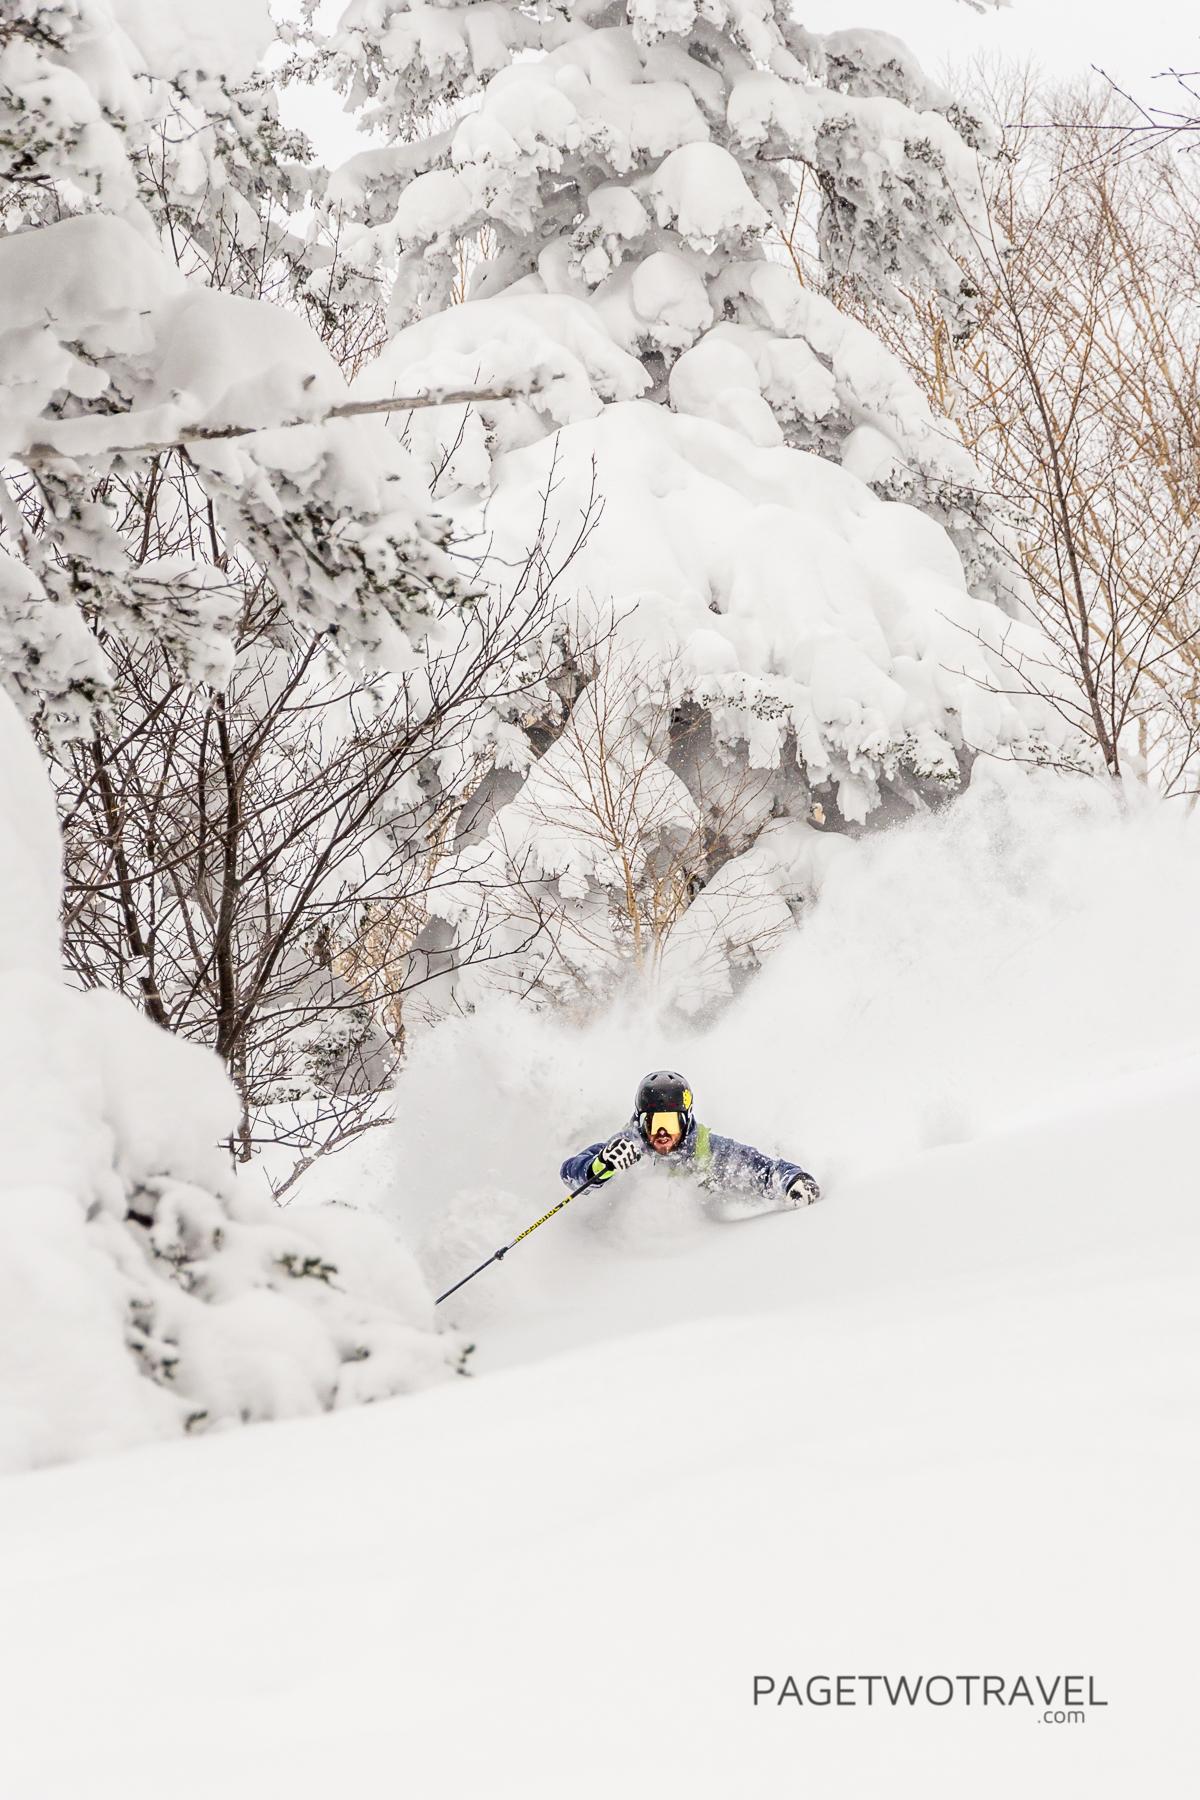 James Winfield enjoying the powder turns at Furanodake